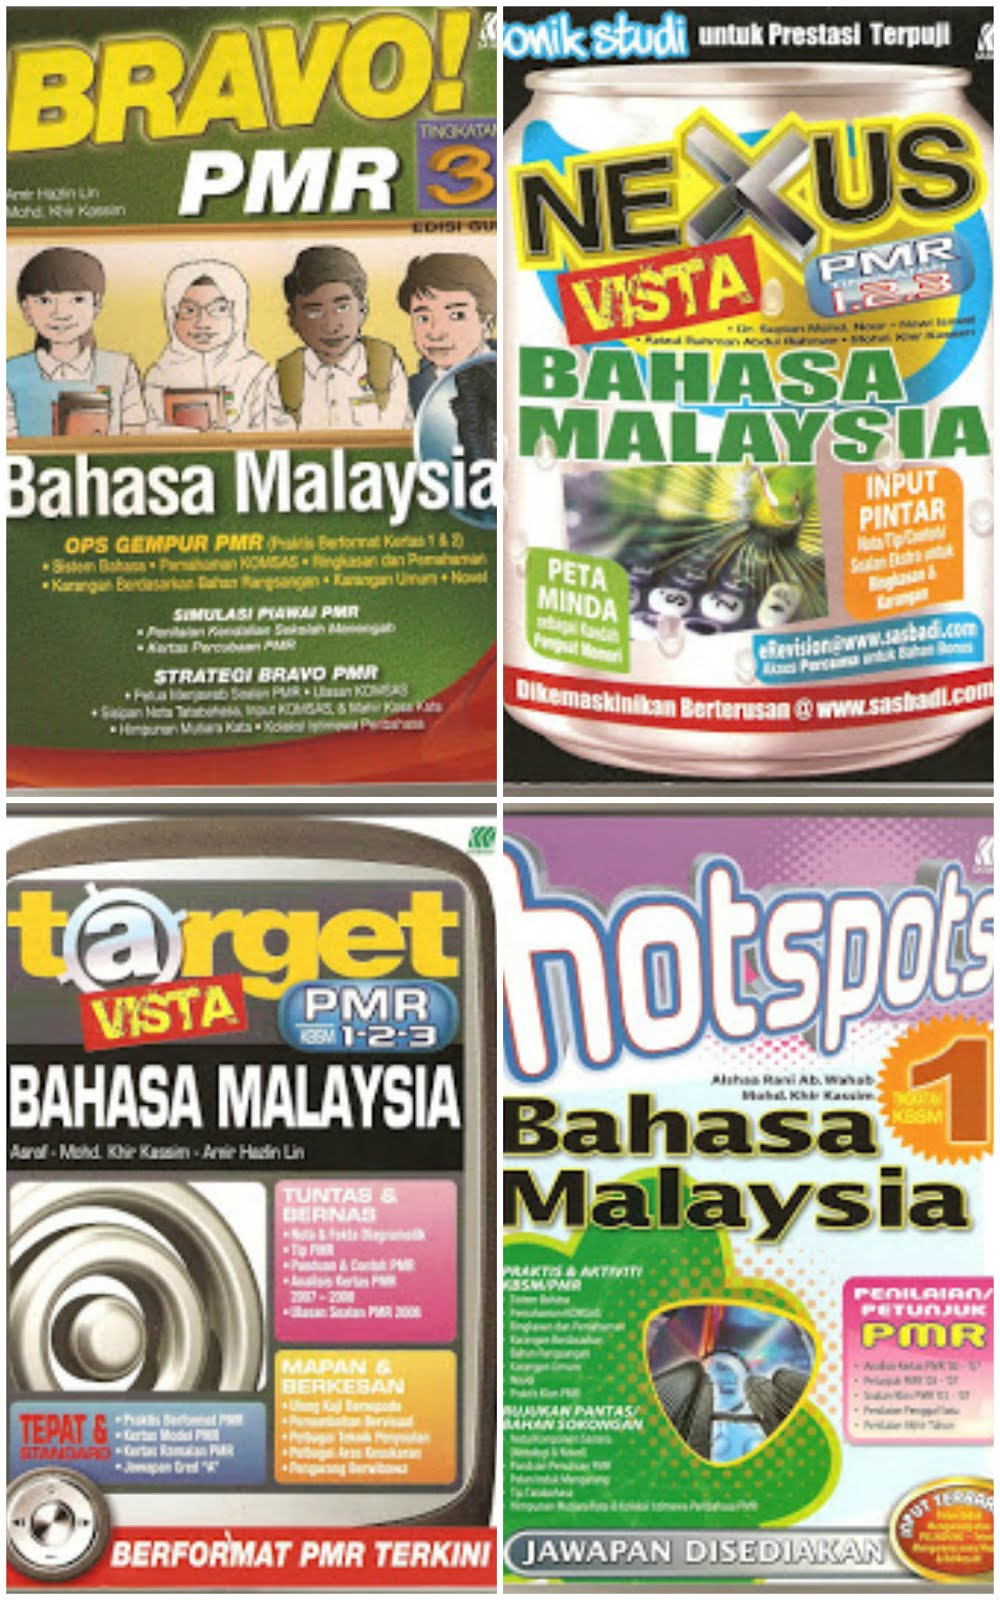 Buku Kerja Bravo PMR T3/Buku Nexus Vista PMR 2009/Buku Target Vista PMR 2009/Buku Hotspots T1 2009